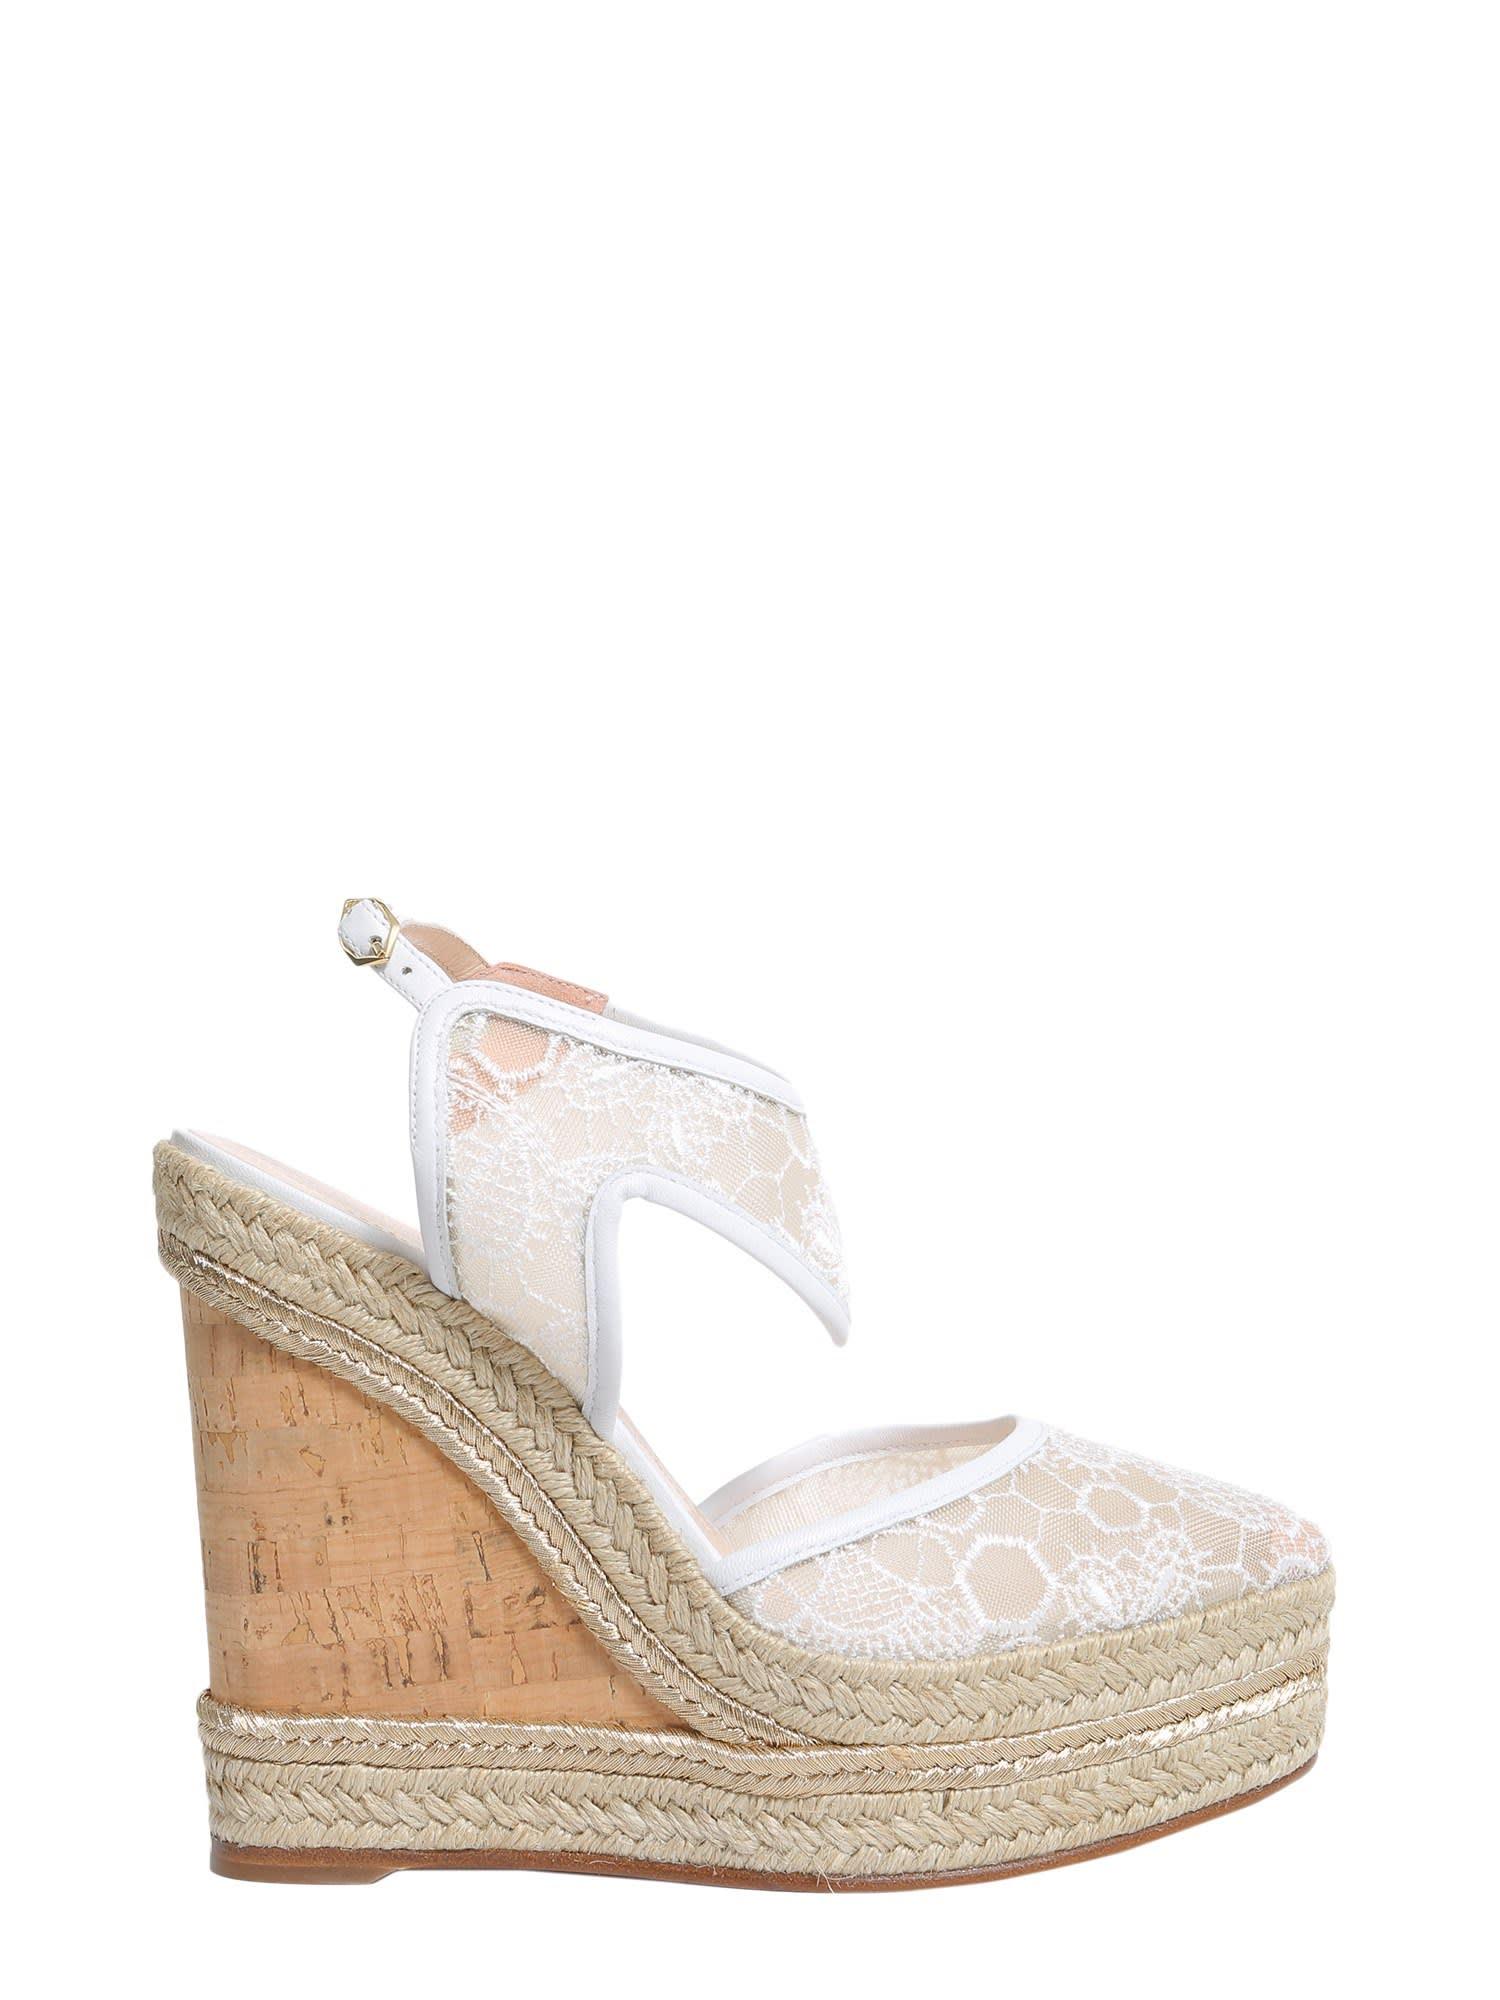 Buy Nicholas Kirkwood Leda Wedge Espadrilles online, shop Nicholas Kirkwood shoes with free shipping